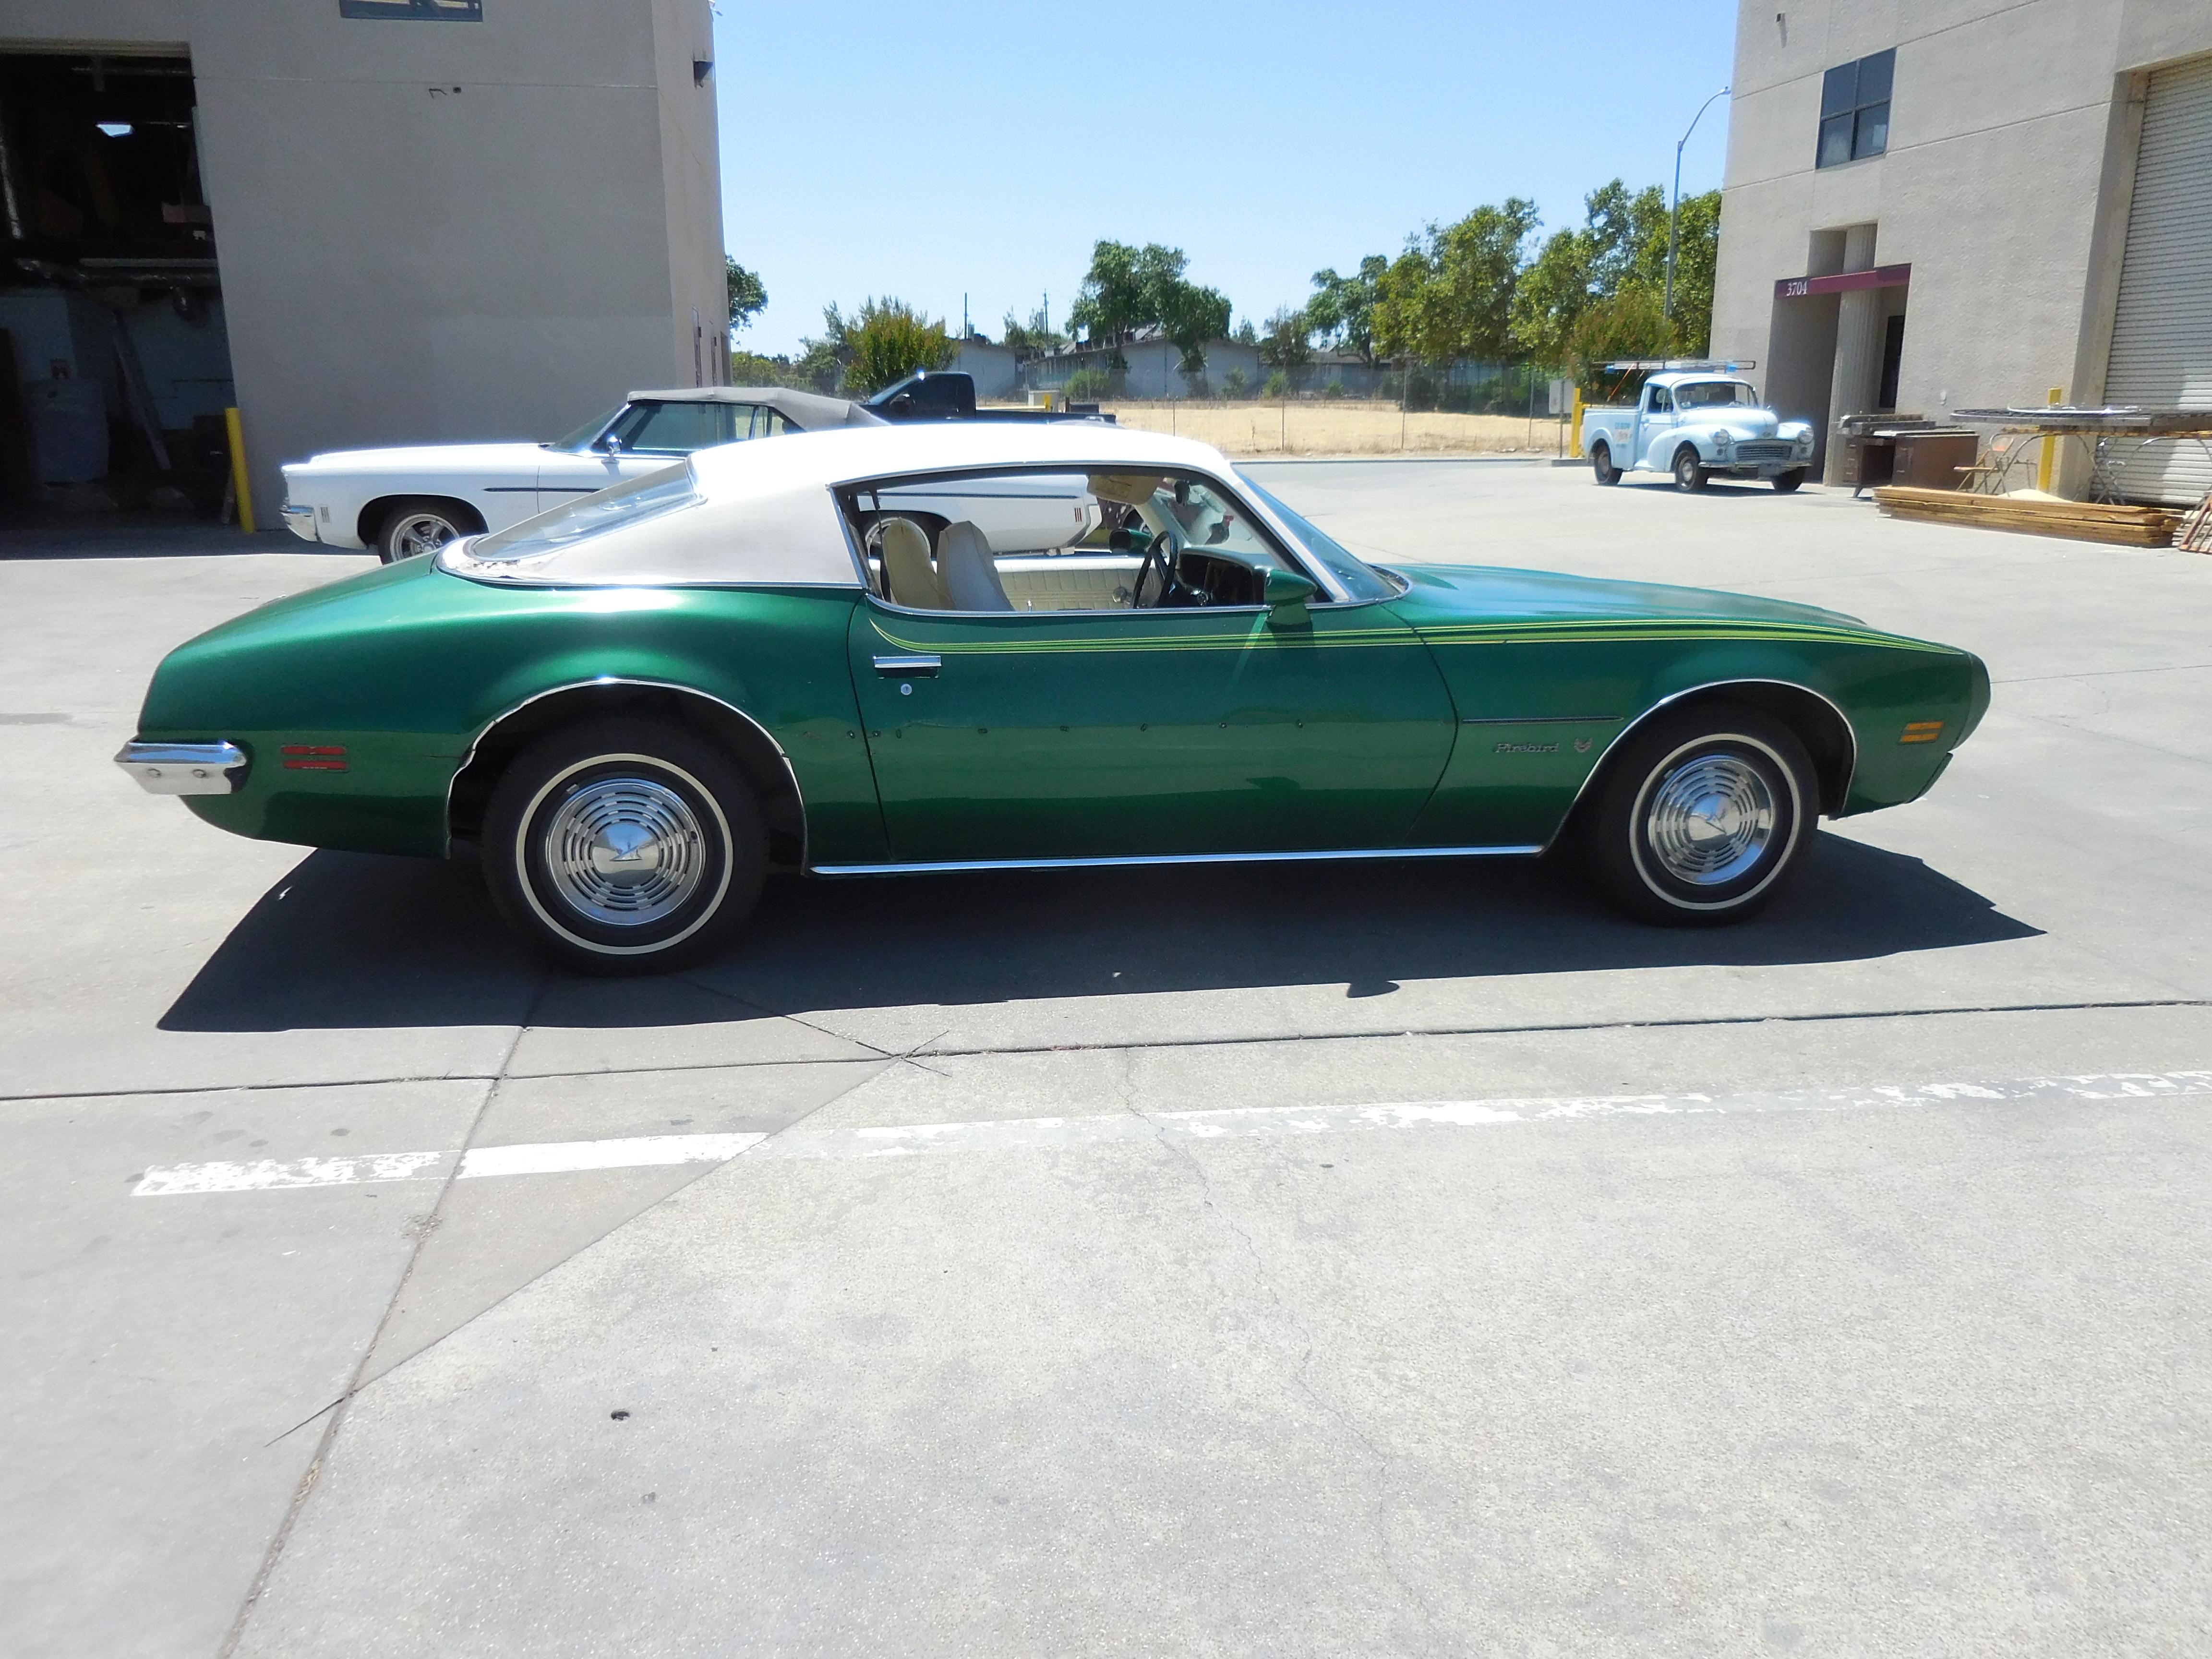 1973, Pontiac, Firebird, 350, AT, Car, For, sale, Car For Sale,